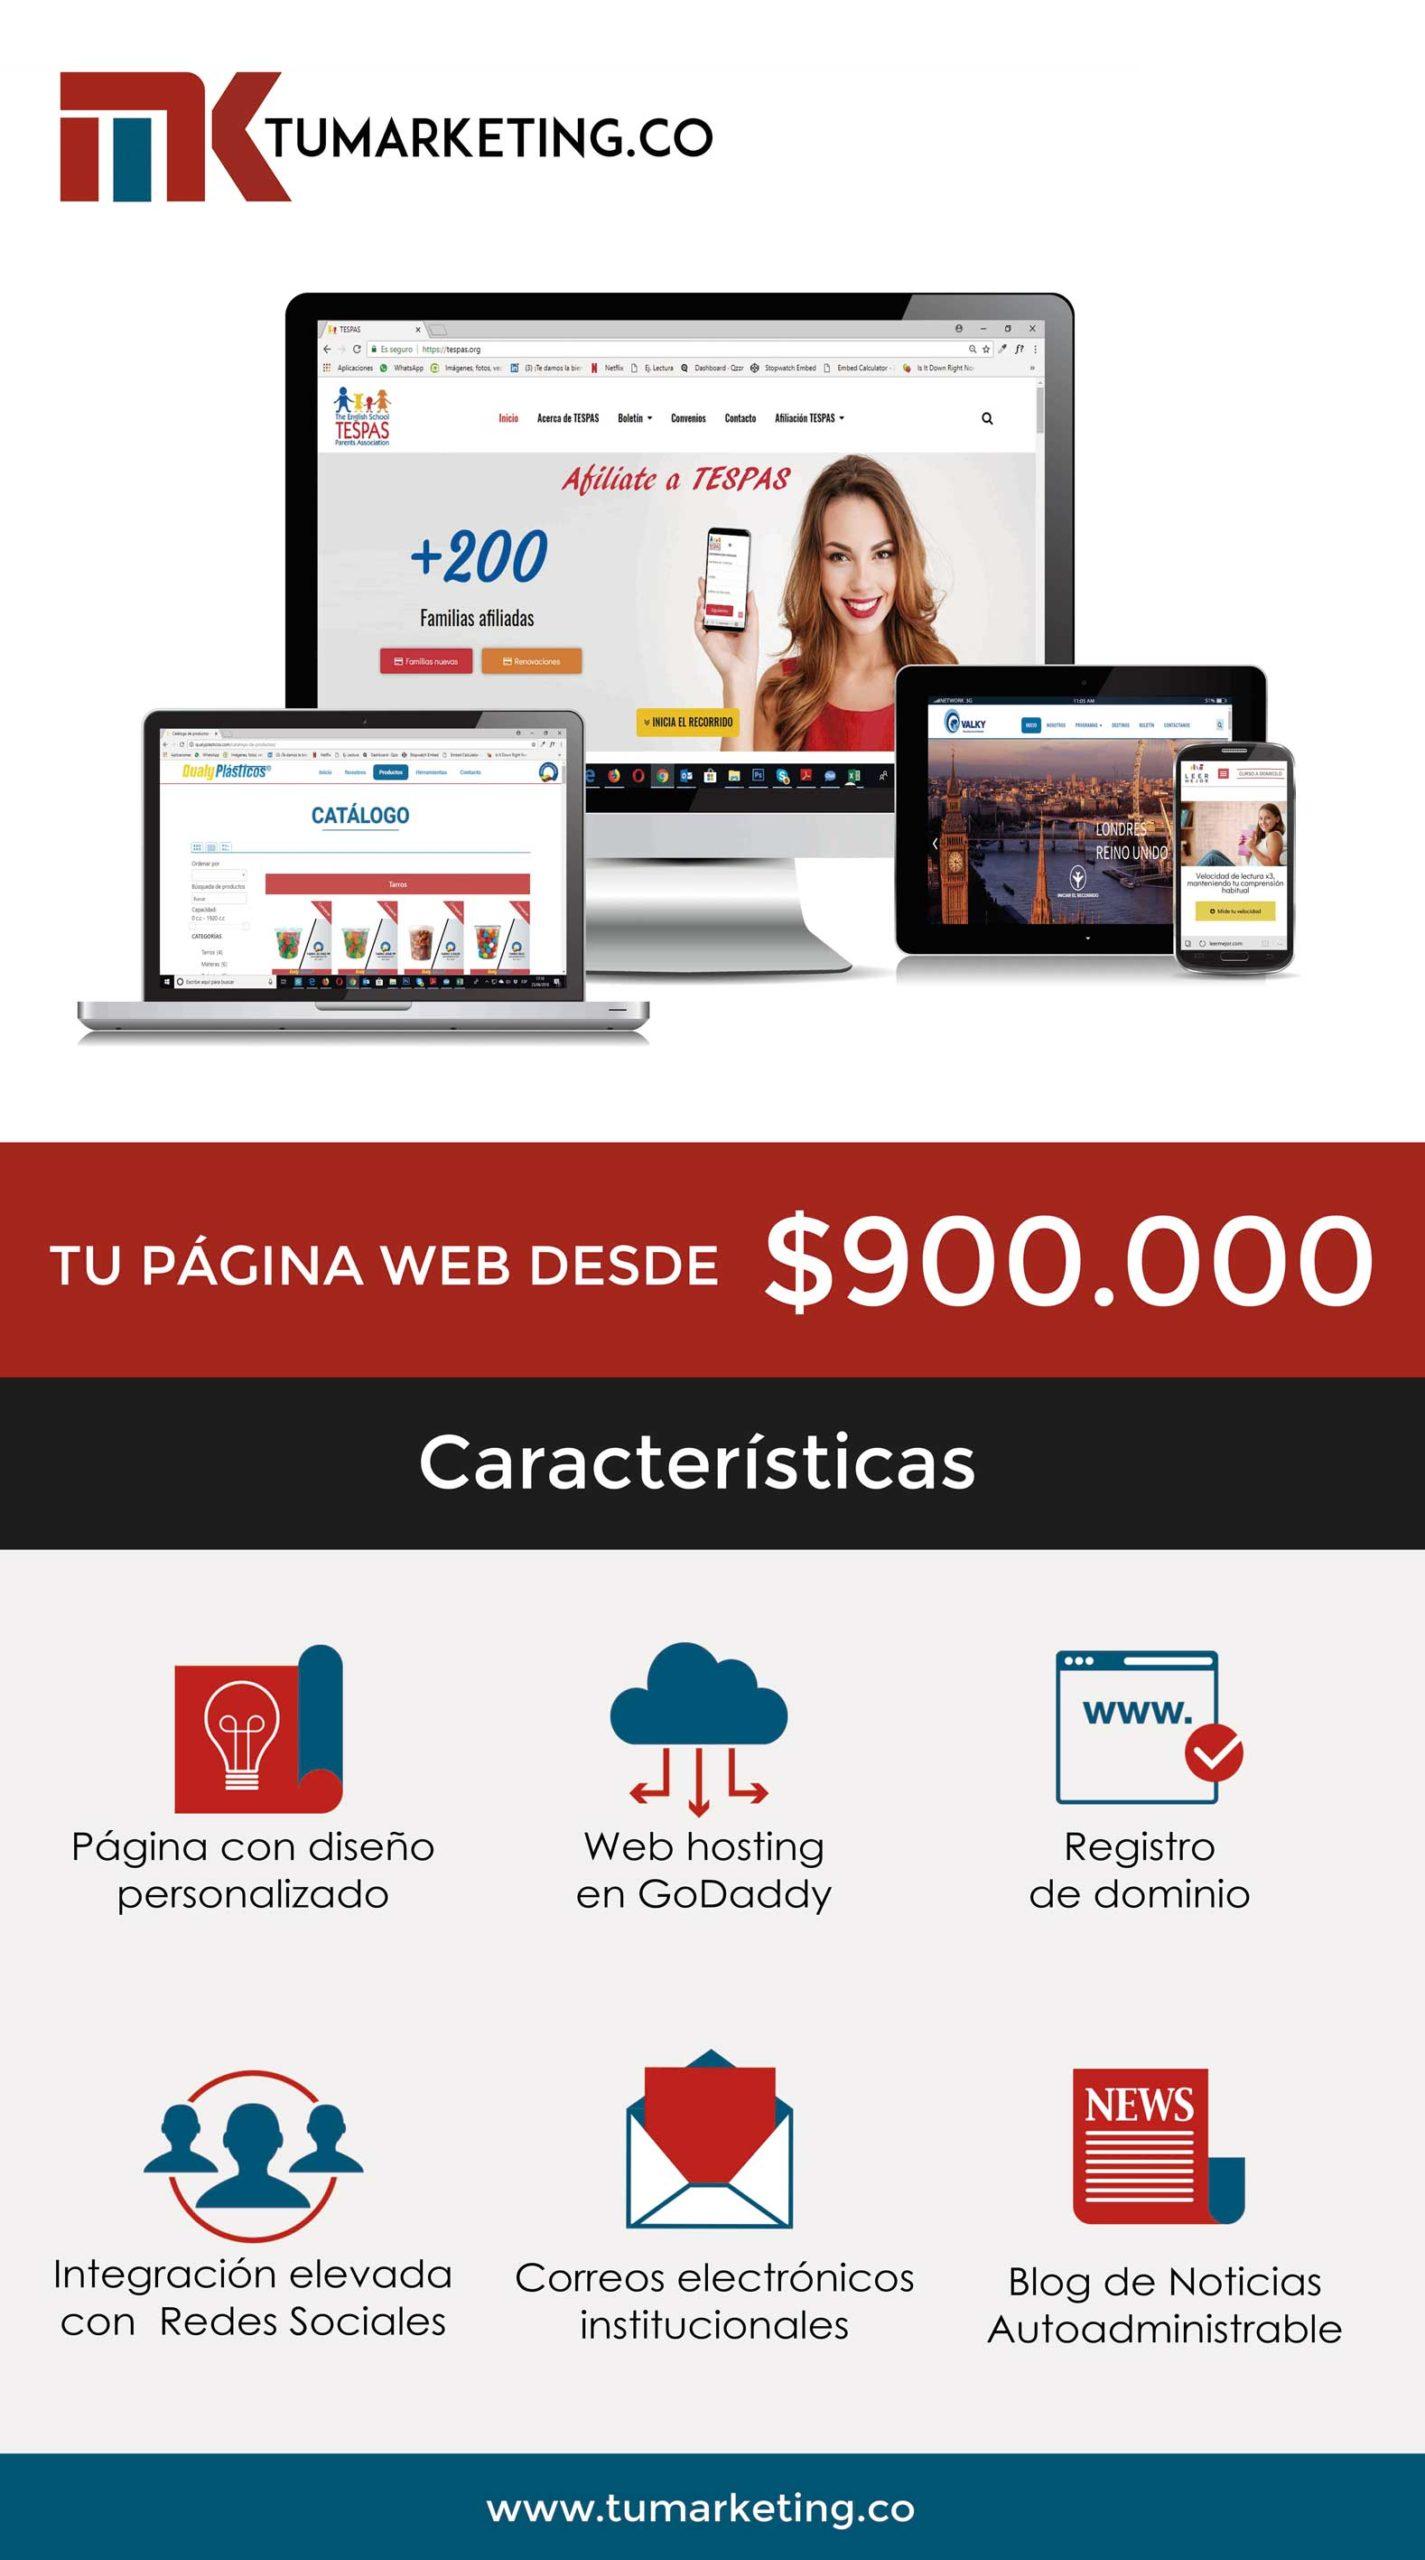 Tu Marketing Bogotá - Oferta general de páginas web